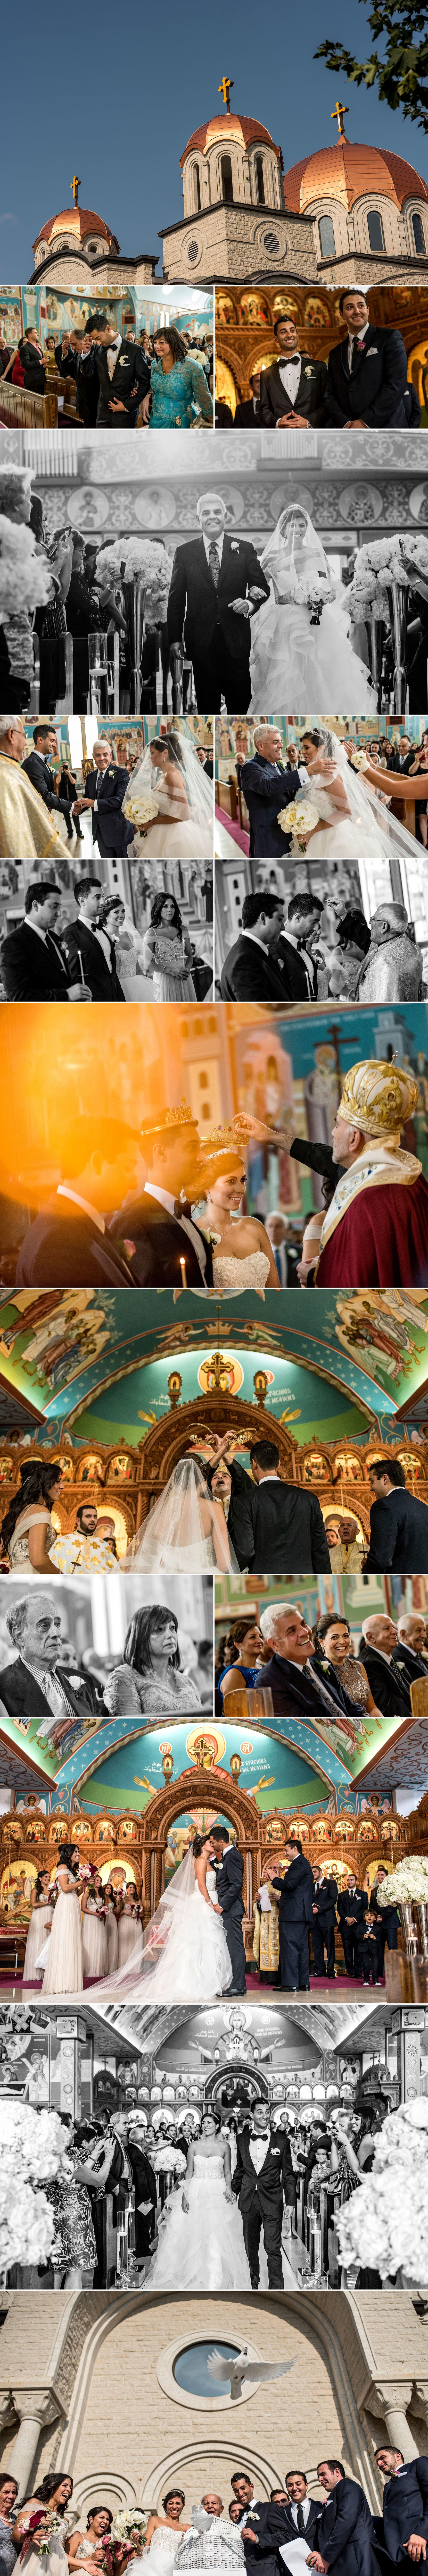 Saint-Elias wedding photographs